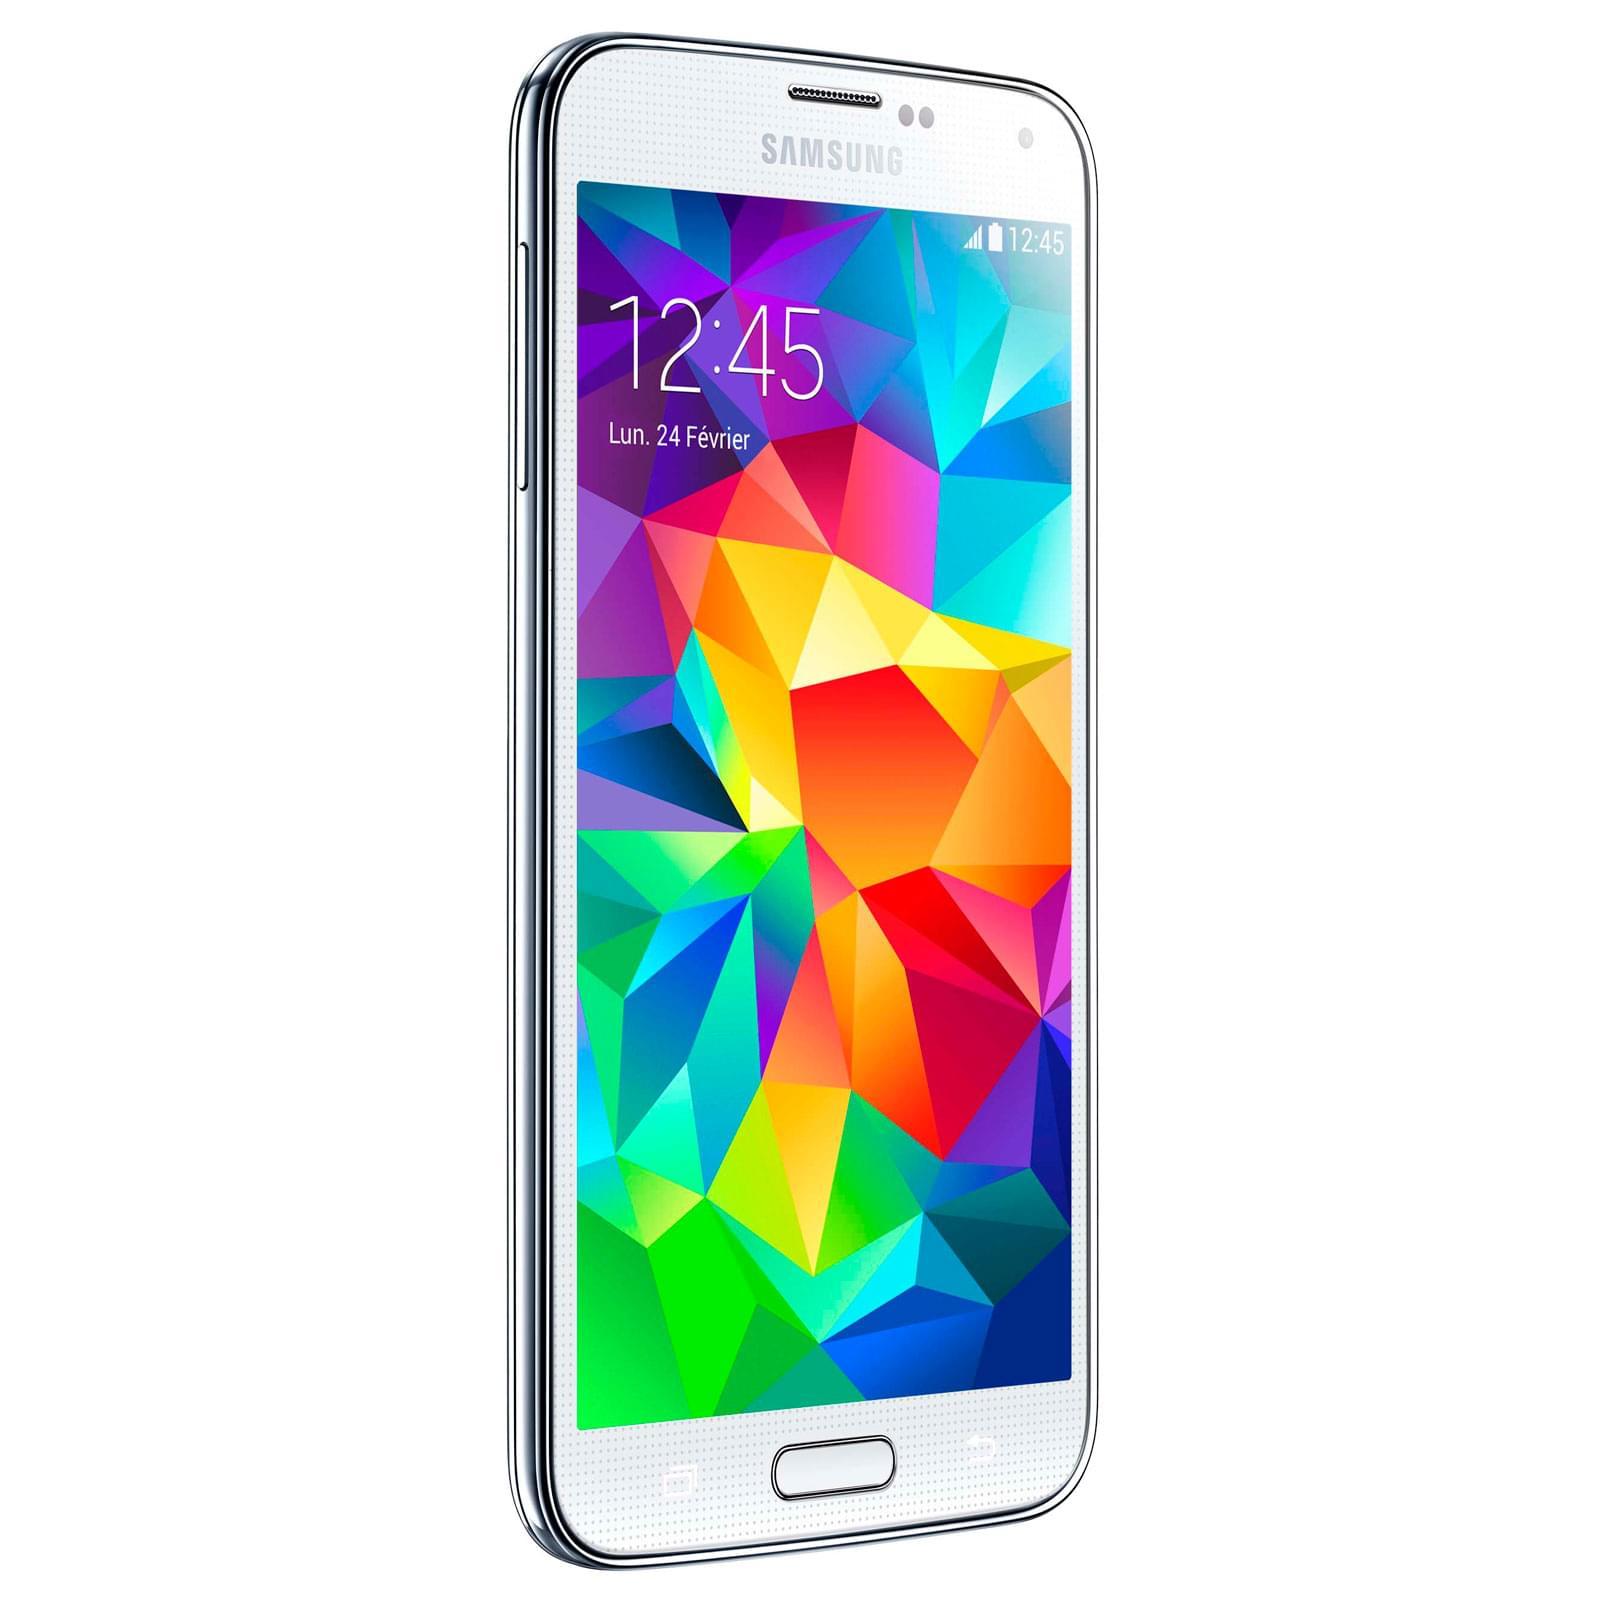 Samsung Galaxy S5 16Go Blanc G900F (SM-G900FZWAXEF) - Achat / Vente Téléphonie sur Cybertek.fr - 0